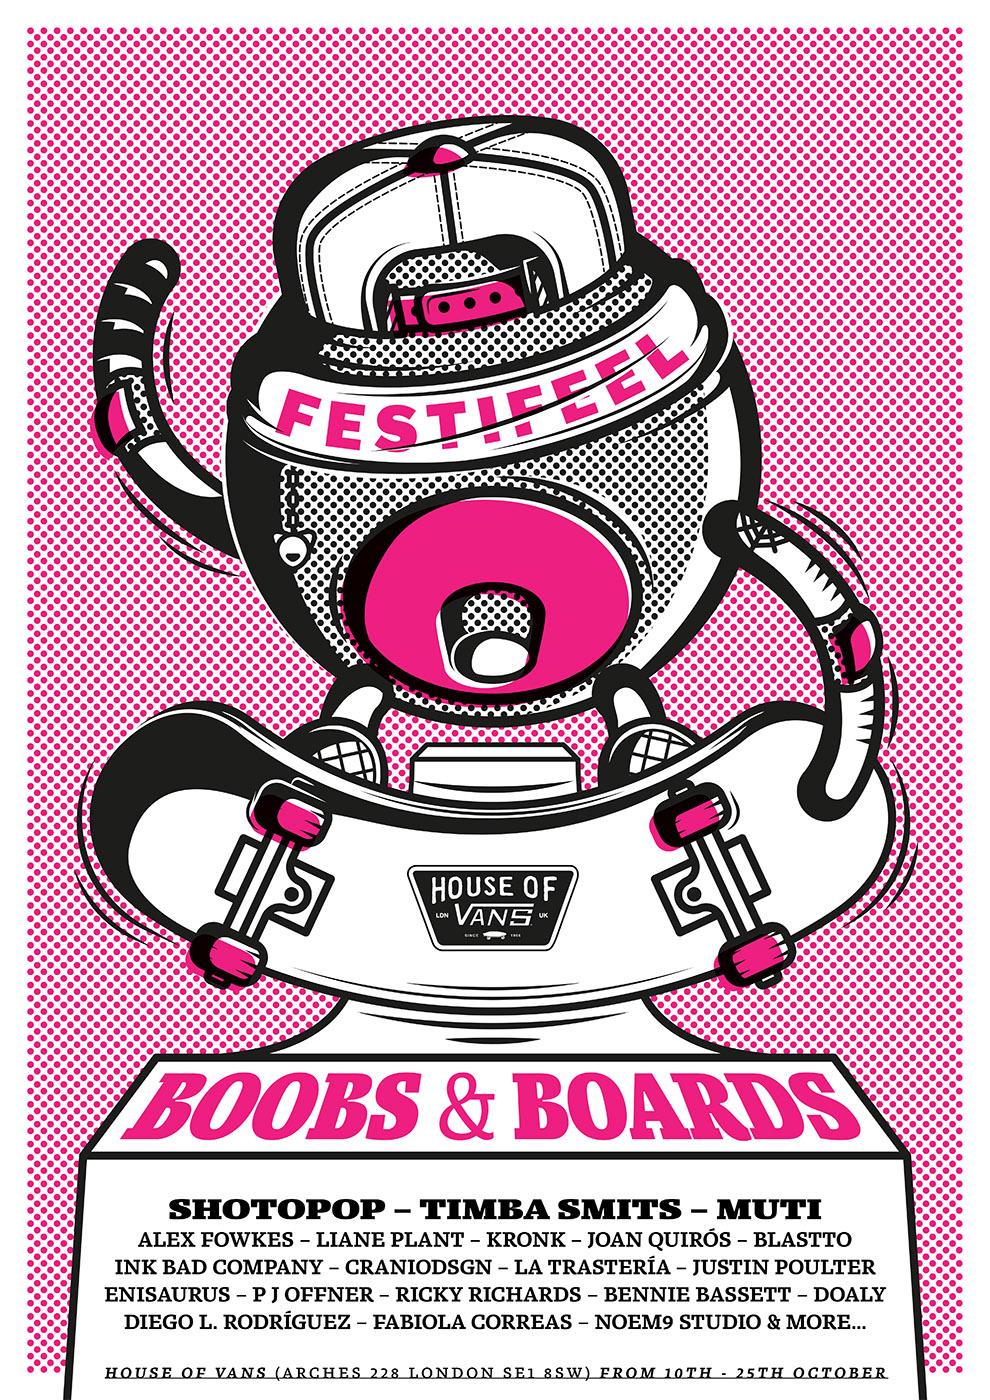 Boobs_Boards_Poster.jpg